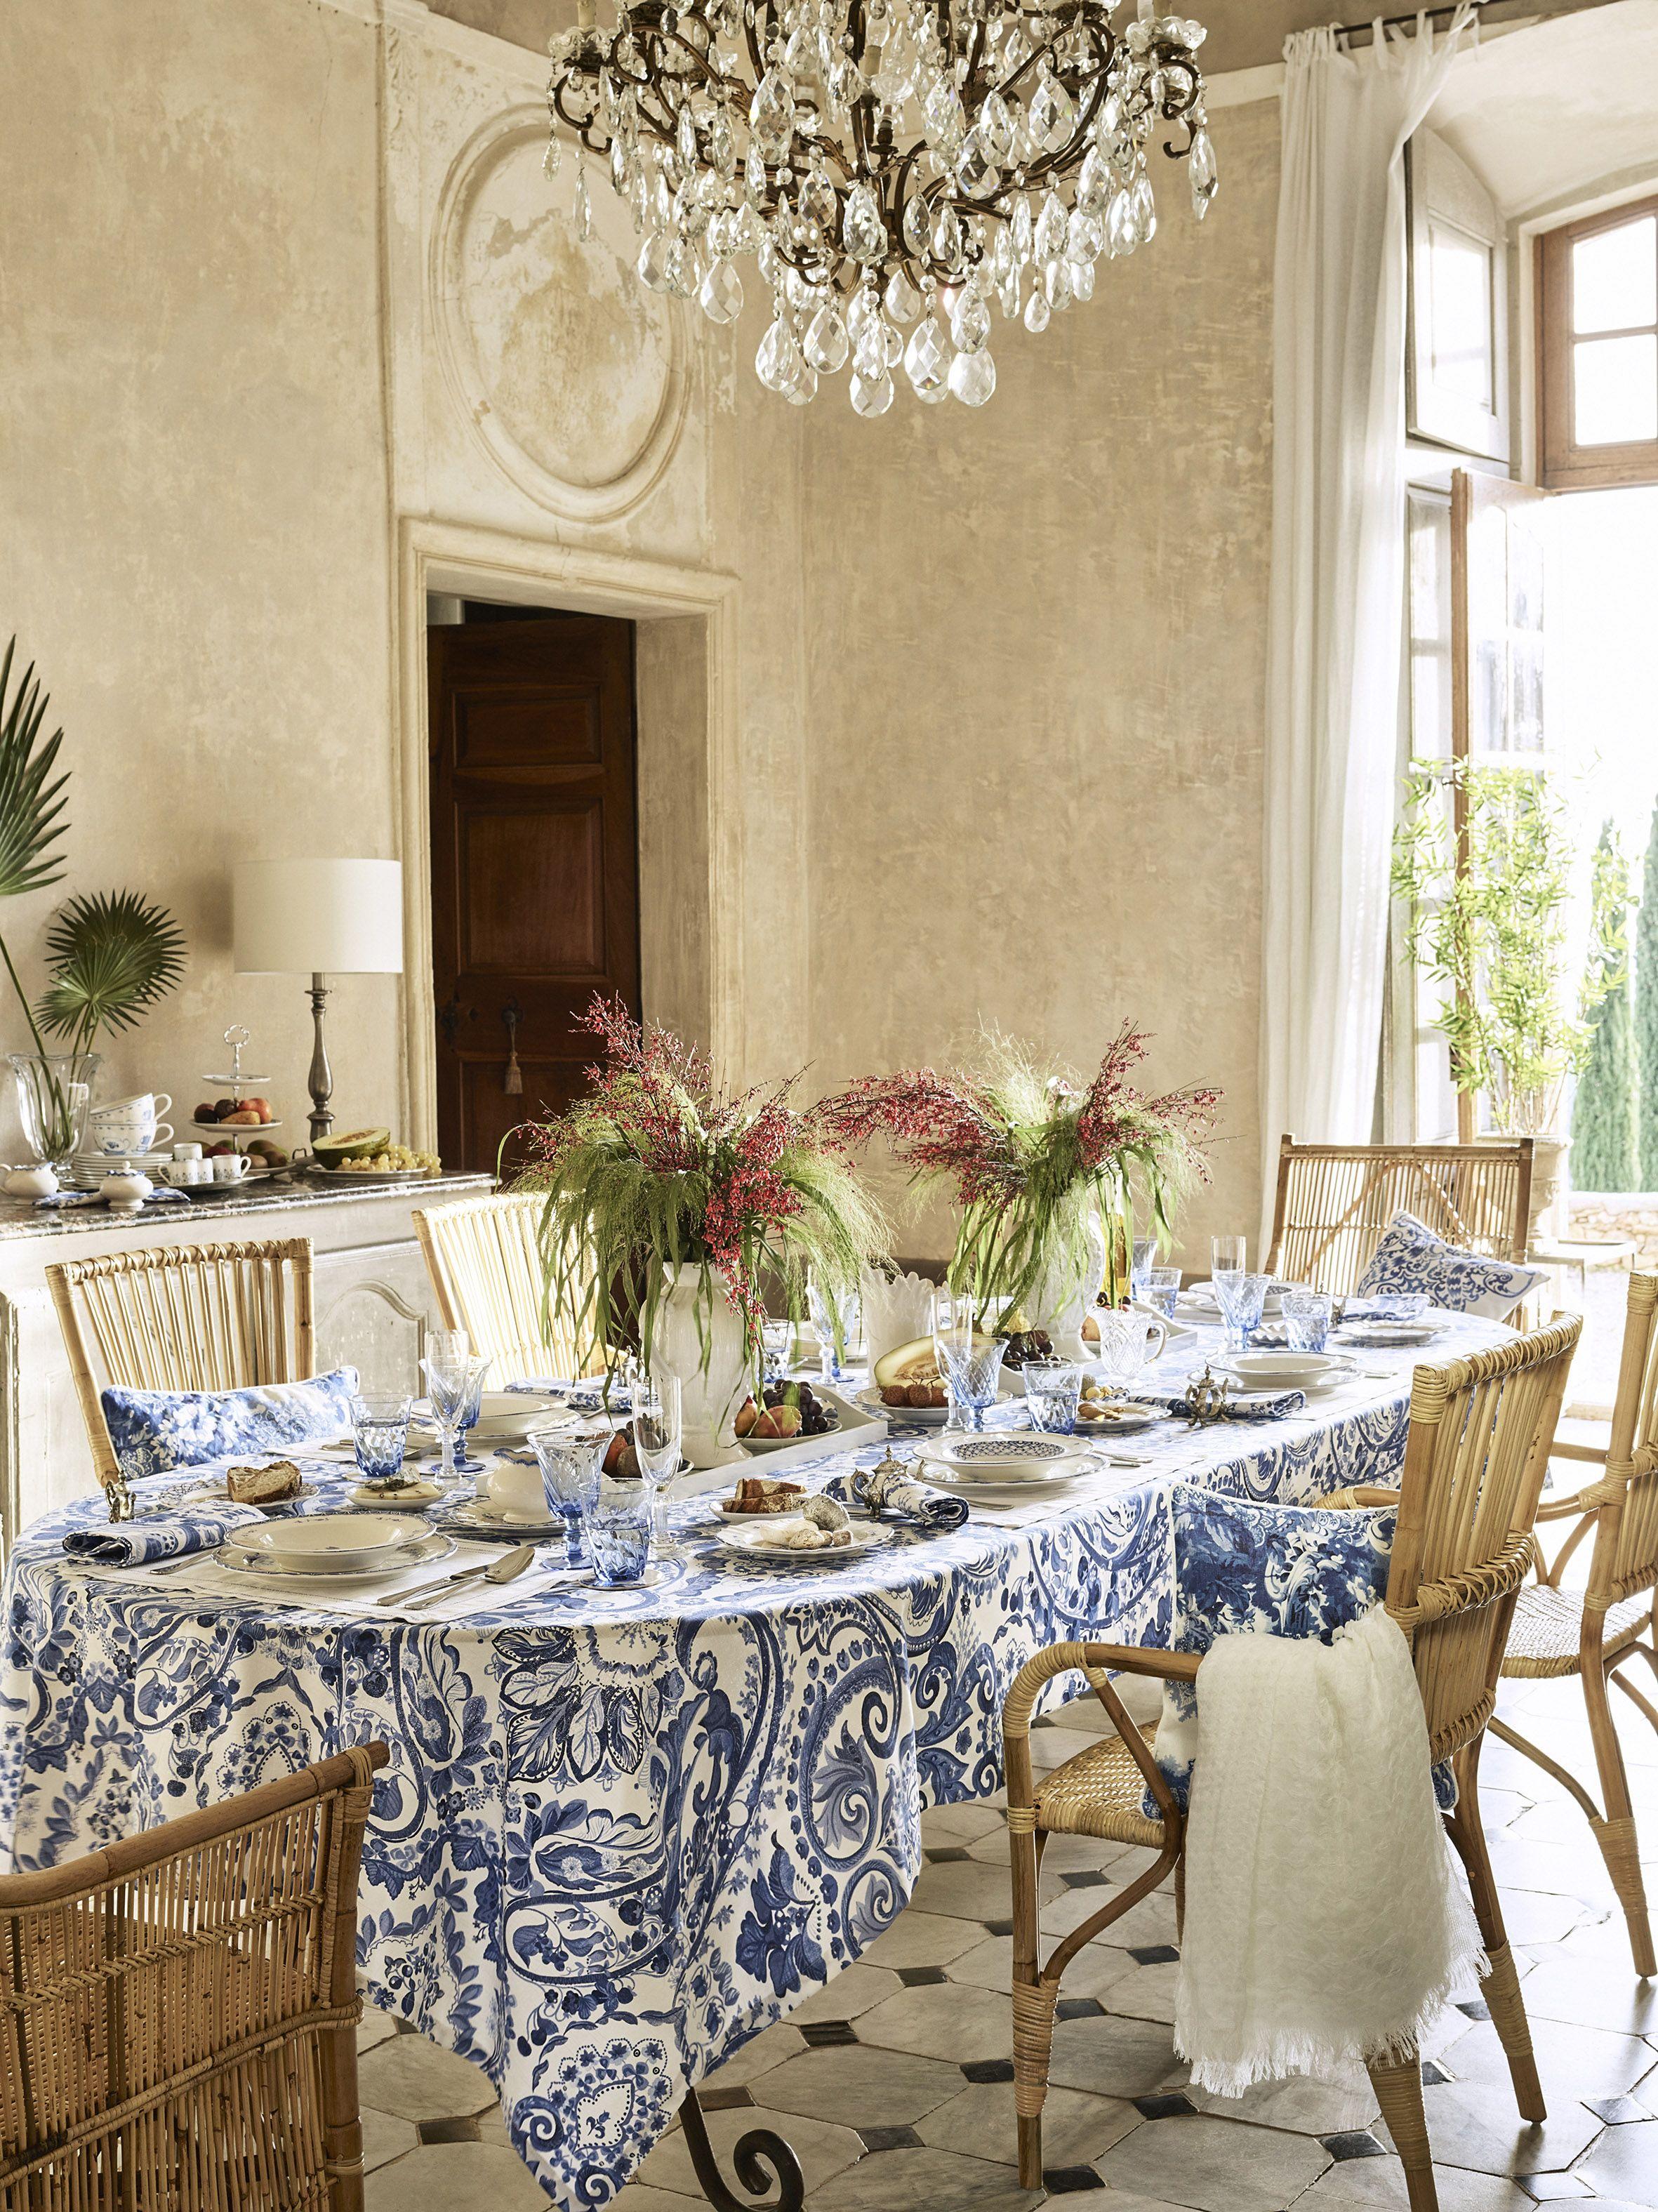 That Tablecloth Is Everything #zarahome #indigo  Yemek Masası Endearing Dining Room Tablecloths Inspiration